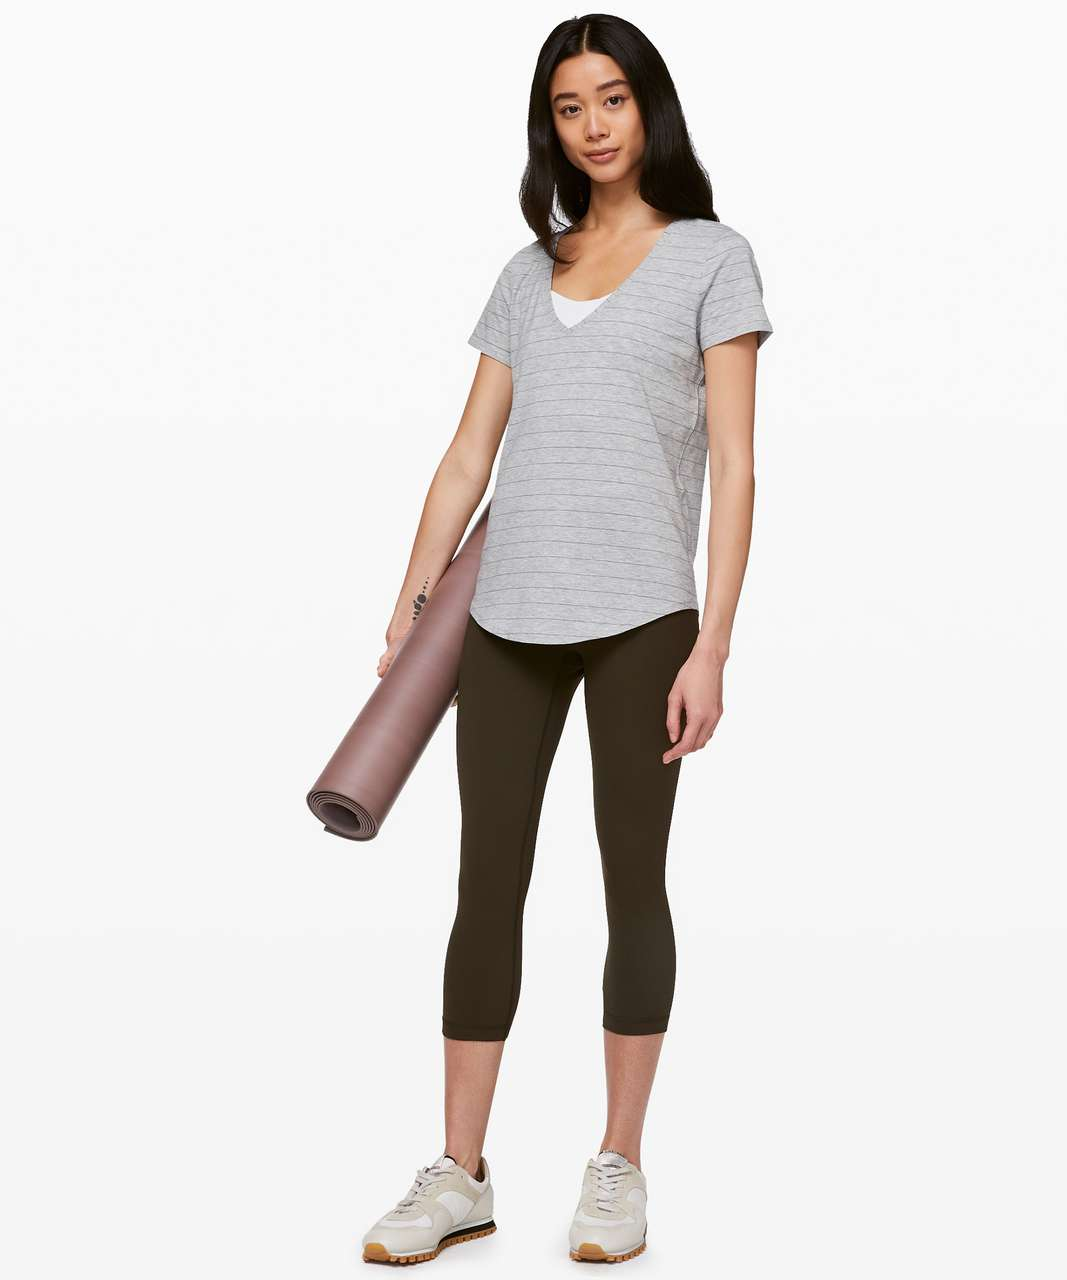 Lululemon Love Tee V - Short Serve Stripe Heathered Core Light Grey Grey Sage